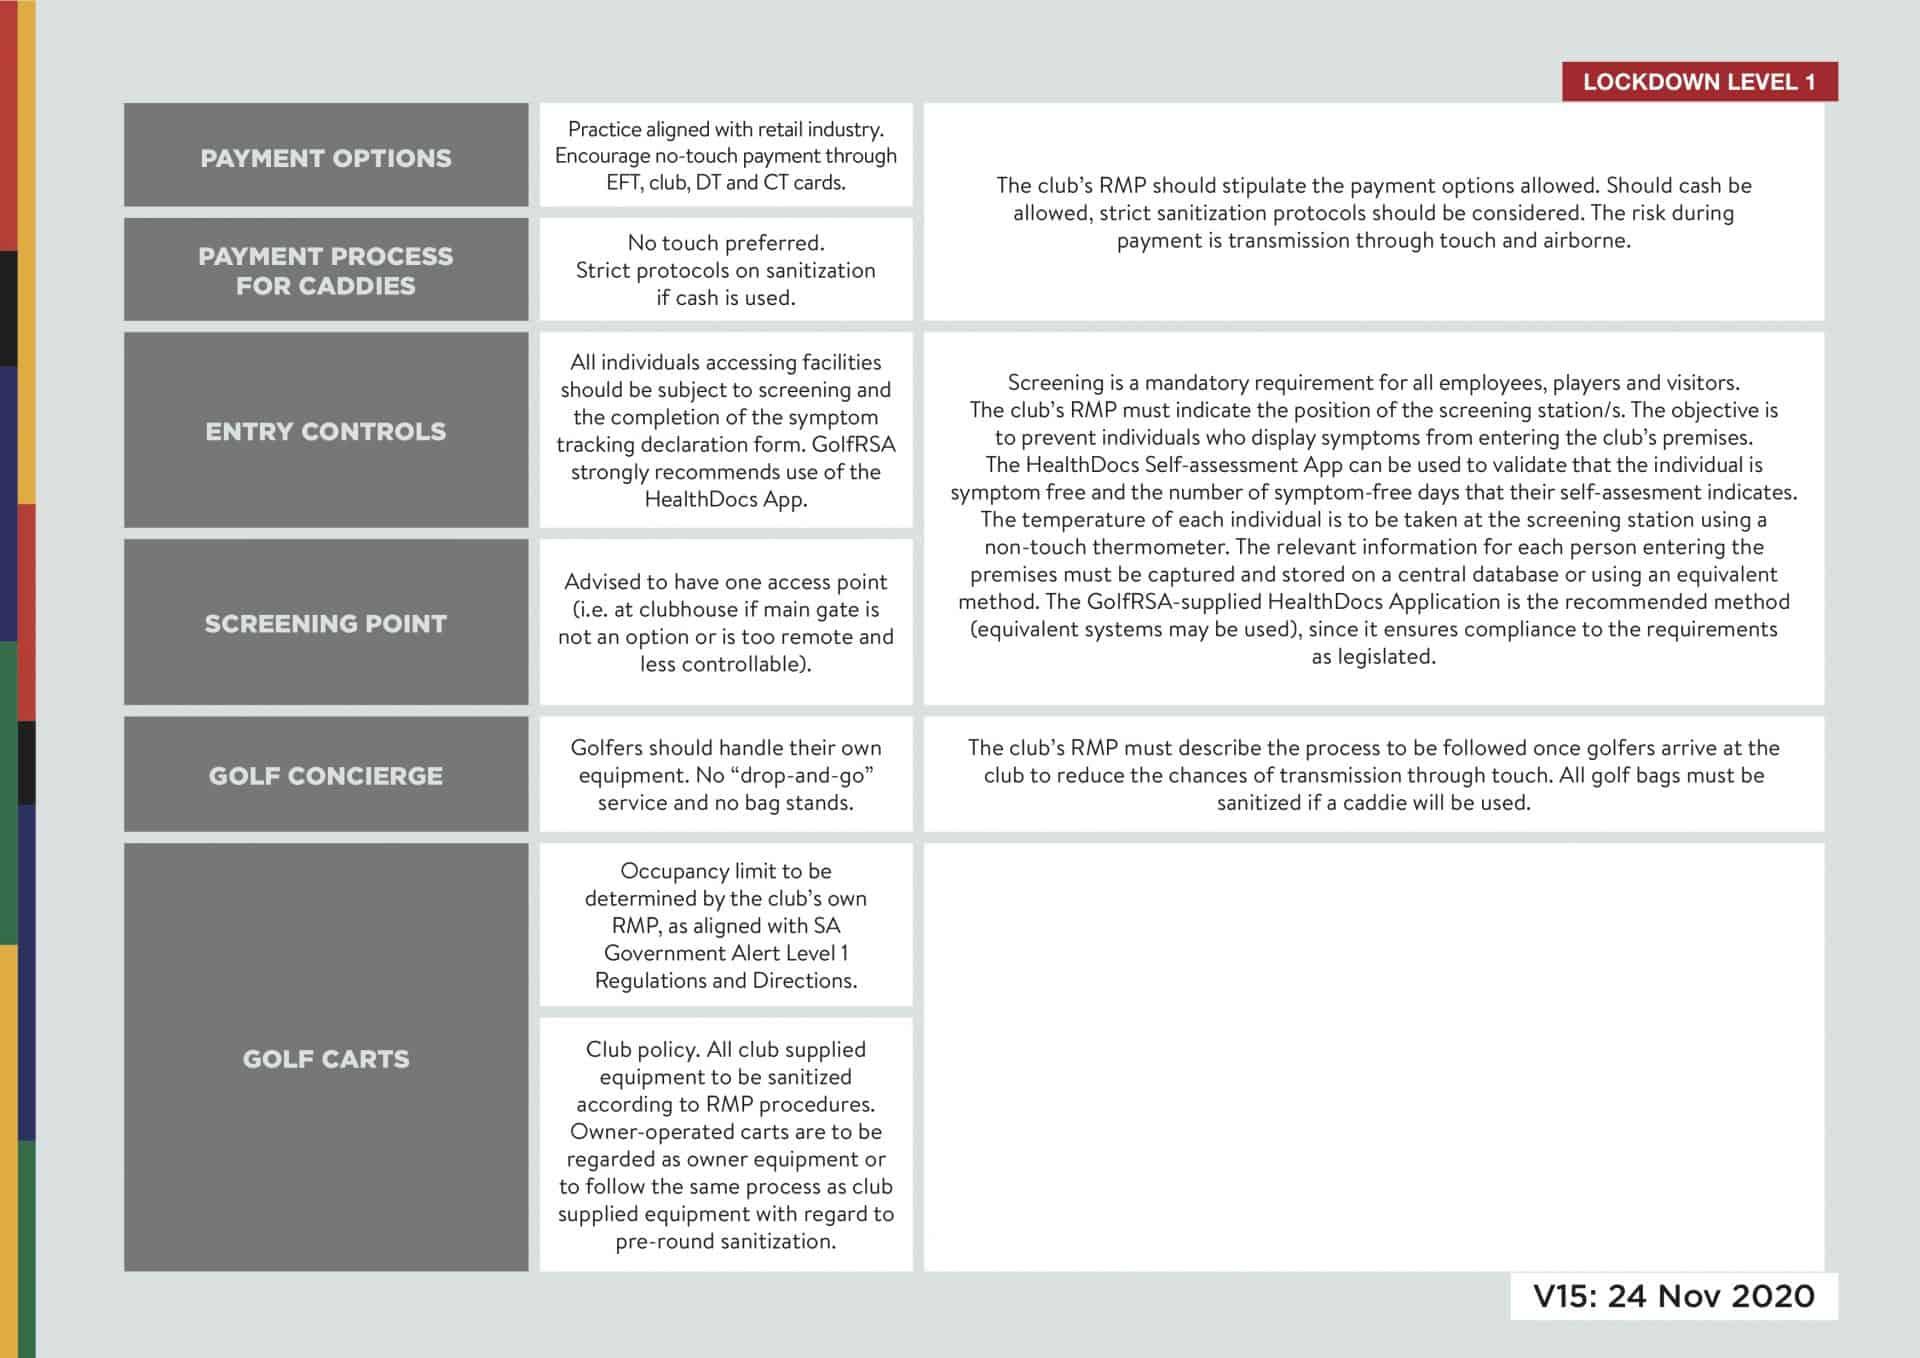 Consolidated Risk Mitigation Guidelines V15 - 2